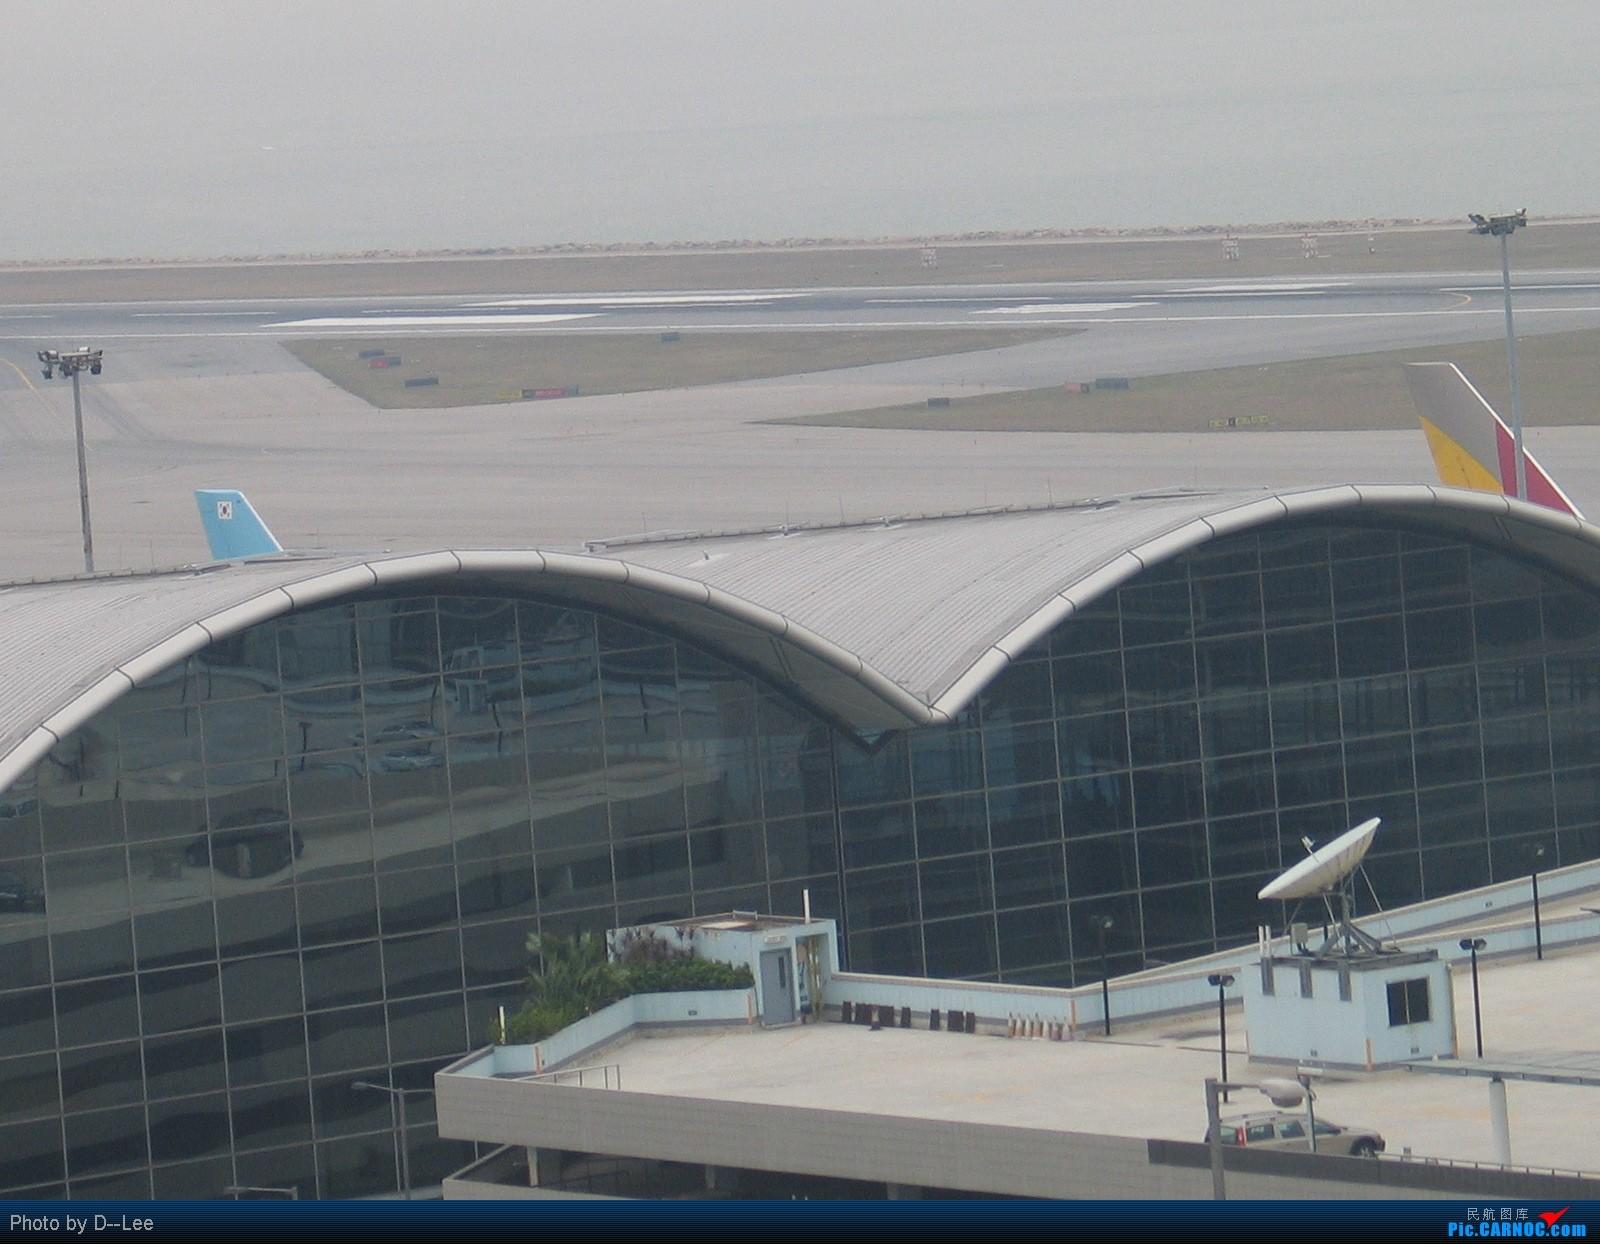 Re:[原创]两韩在香港,09最后一帖 BOEING 747-400 B- 中国香港赤鱲角国际机场 中国香港赤鱲角国际机场